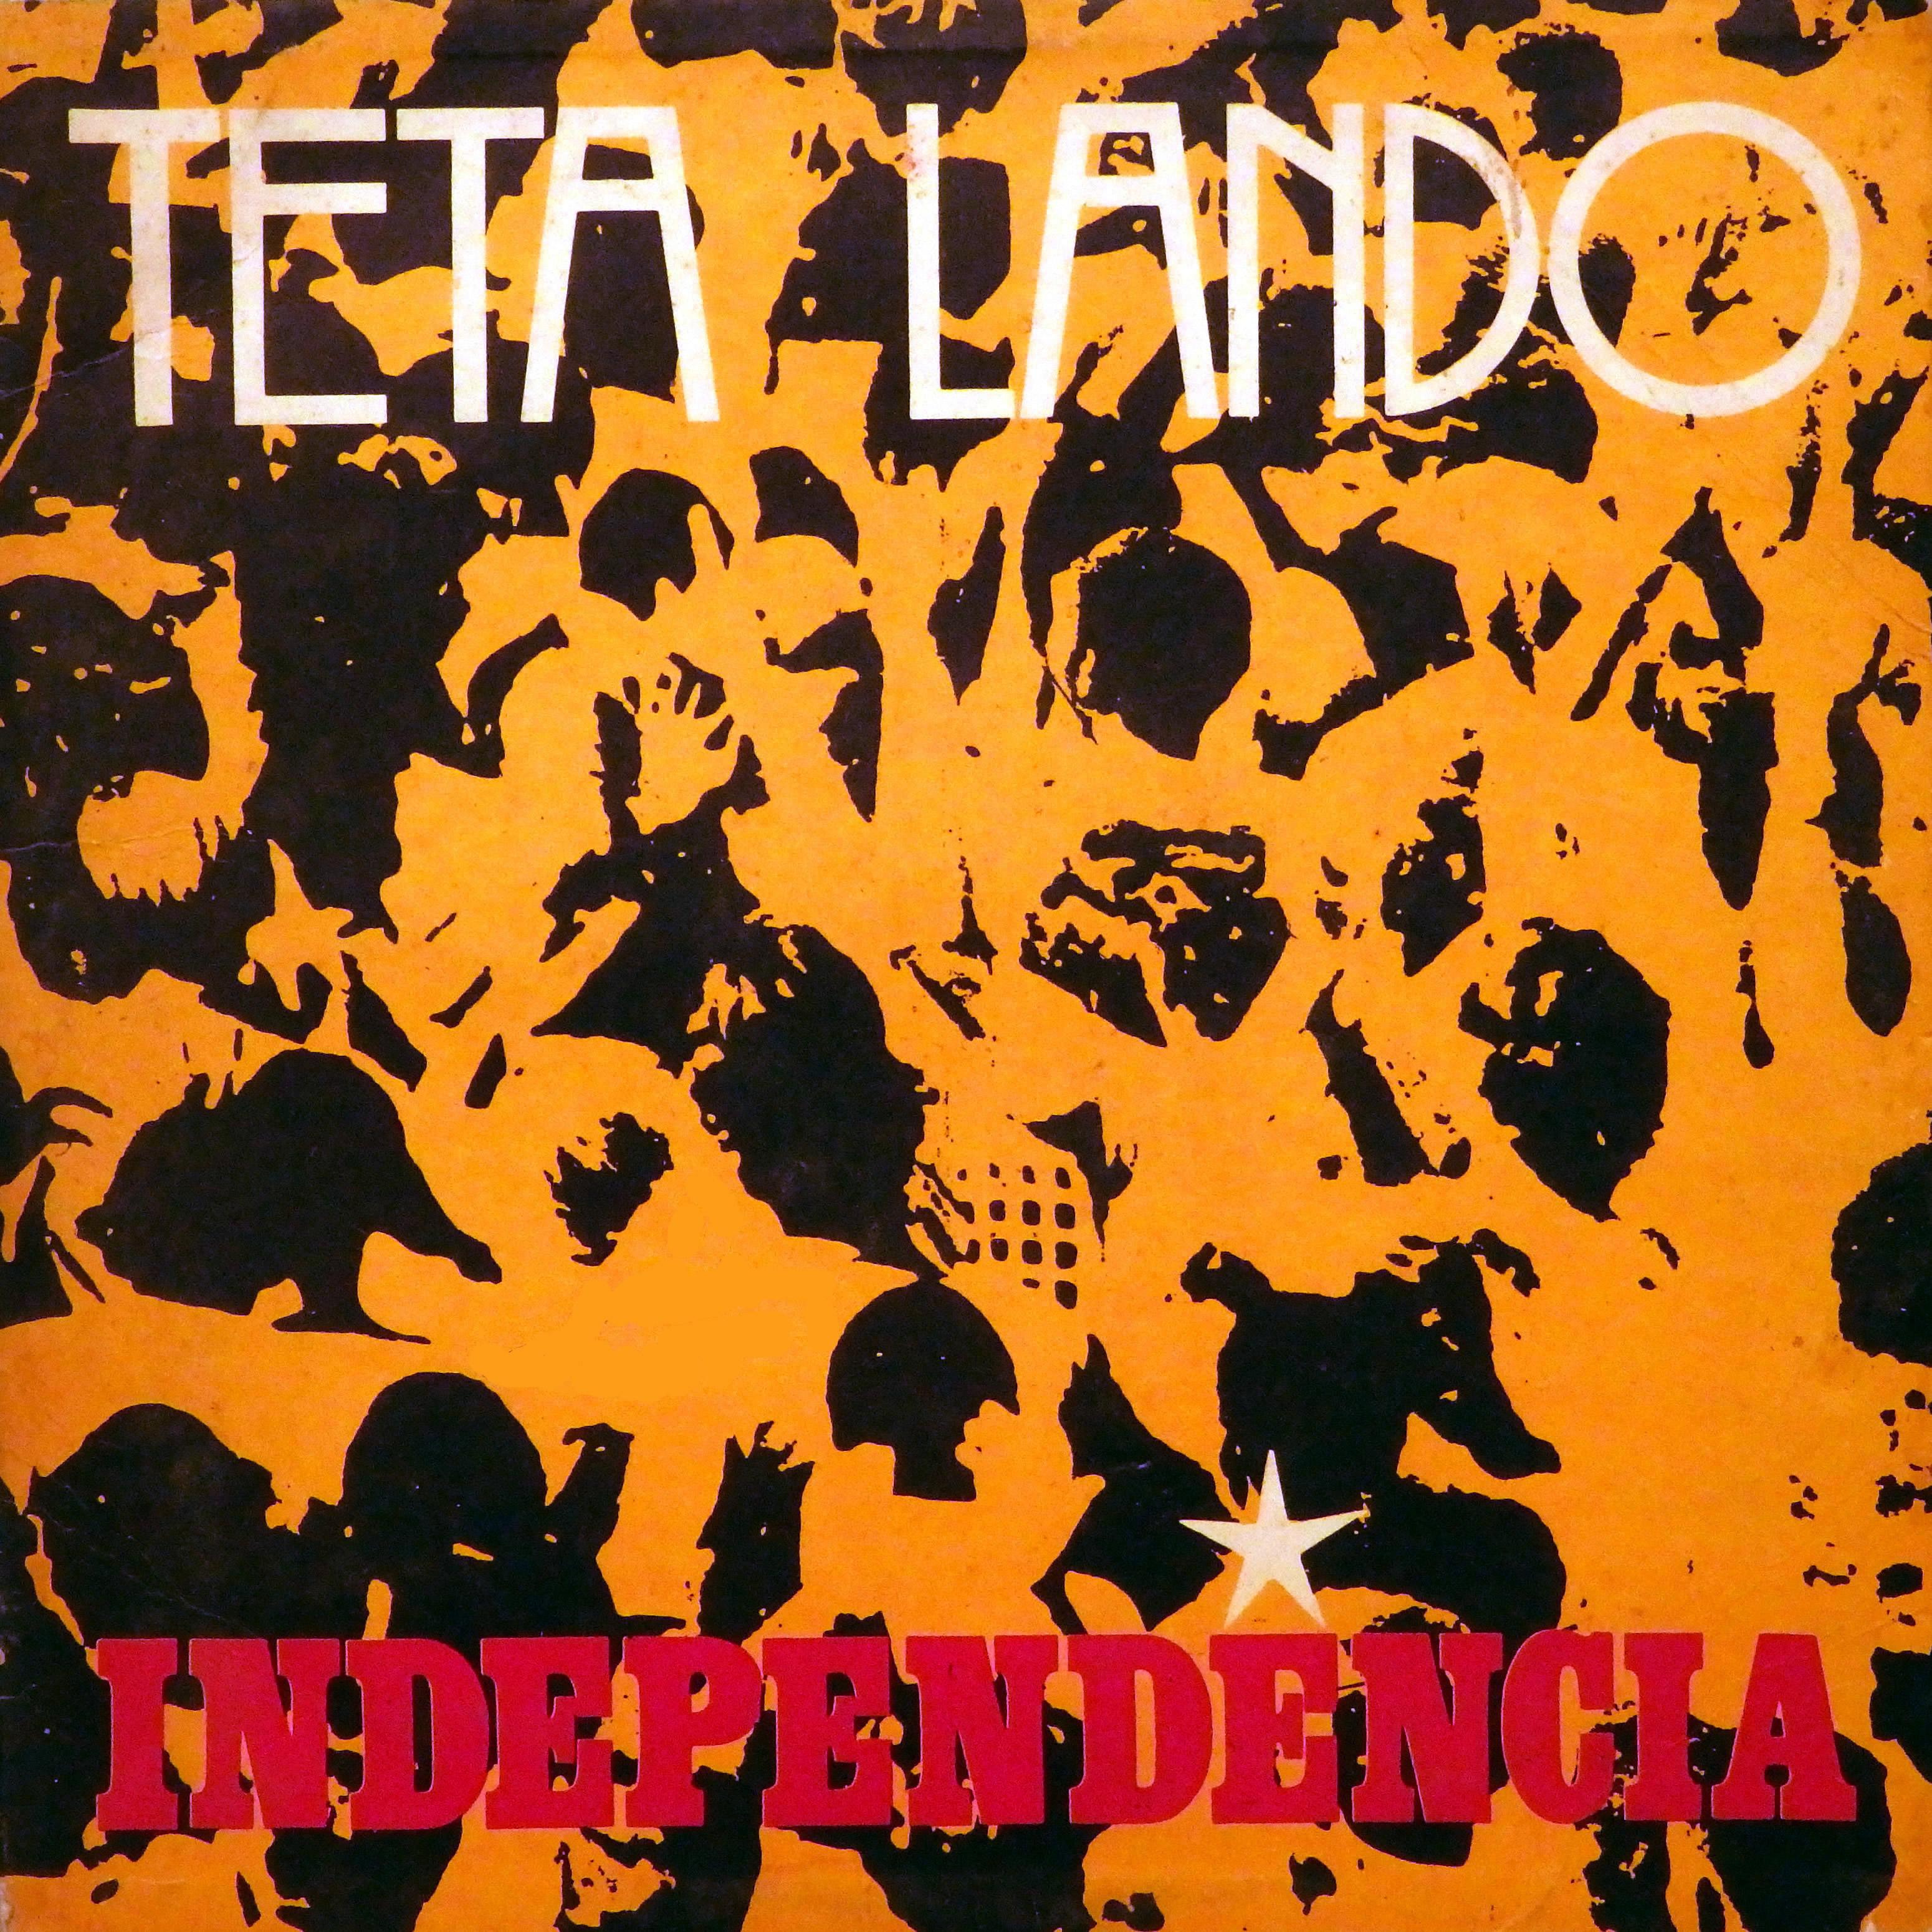 gebruikte cd salsa en latin